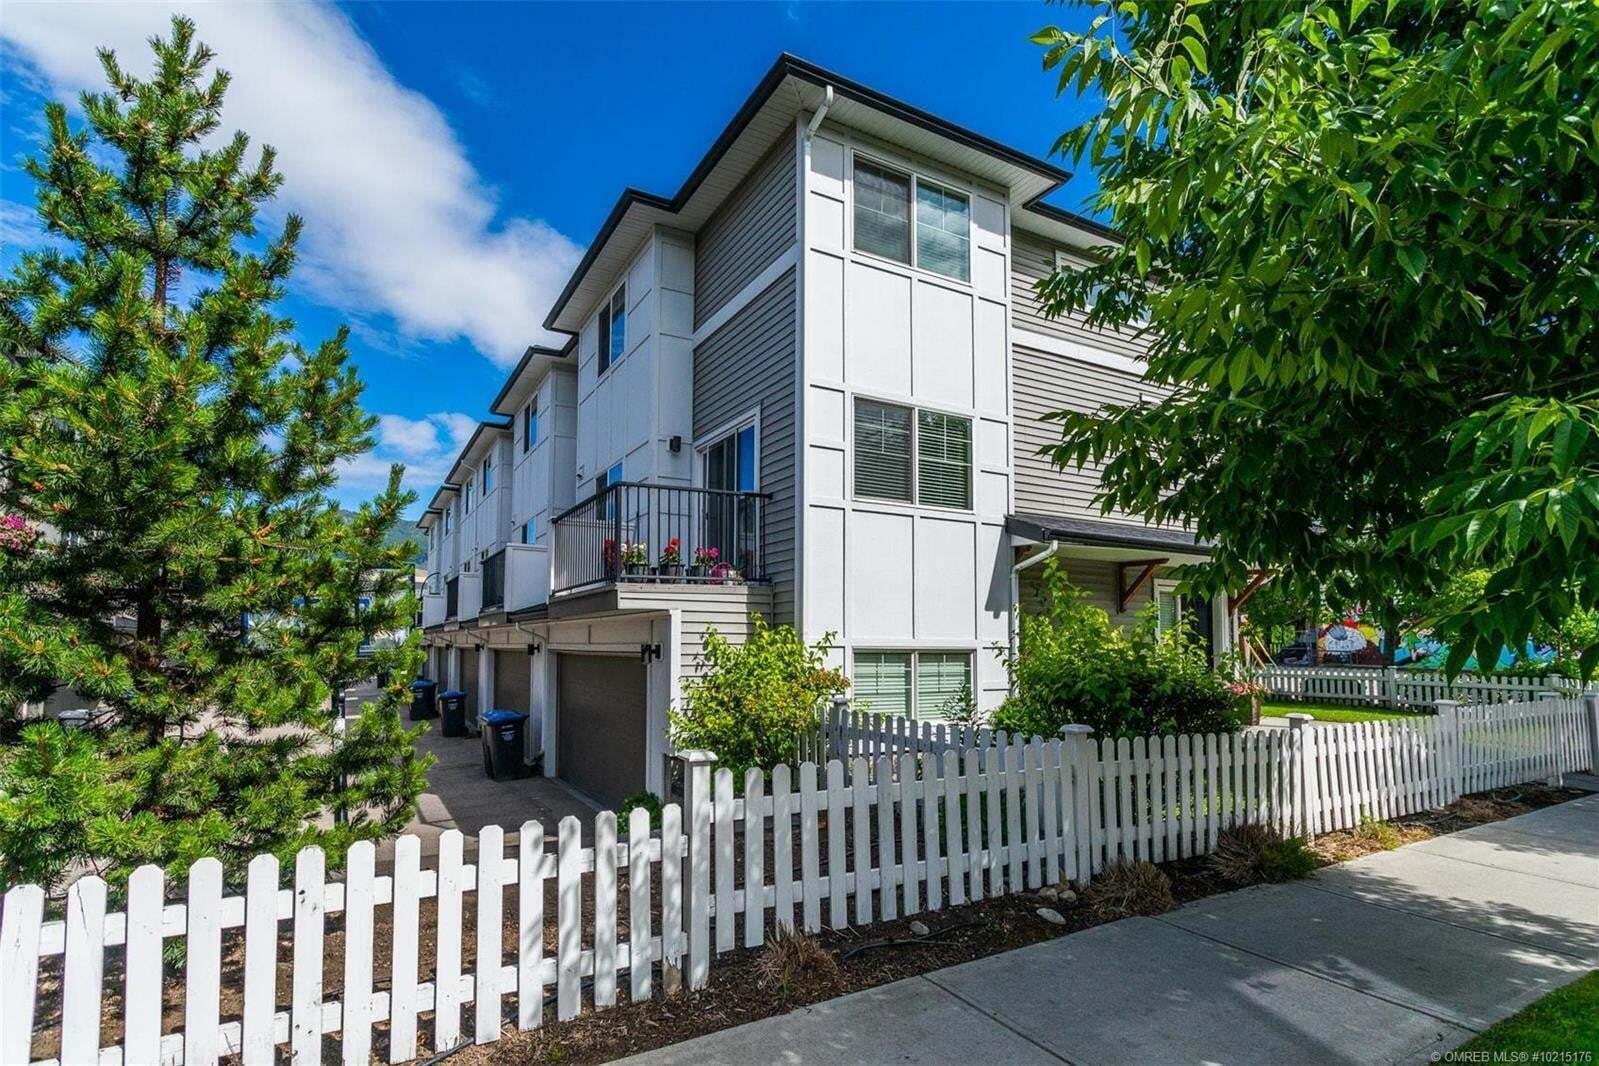 Townhouse for sale at 120 Hartman Rd Unit 114 Kelowna British Columbia - MLS: 10215176